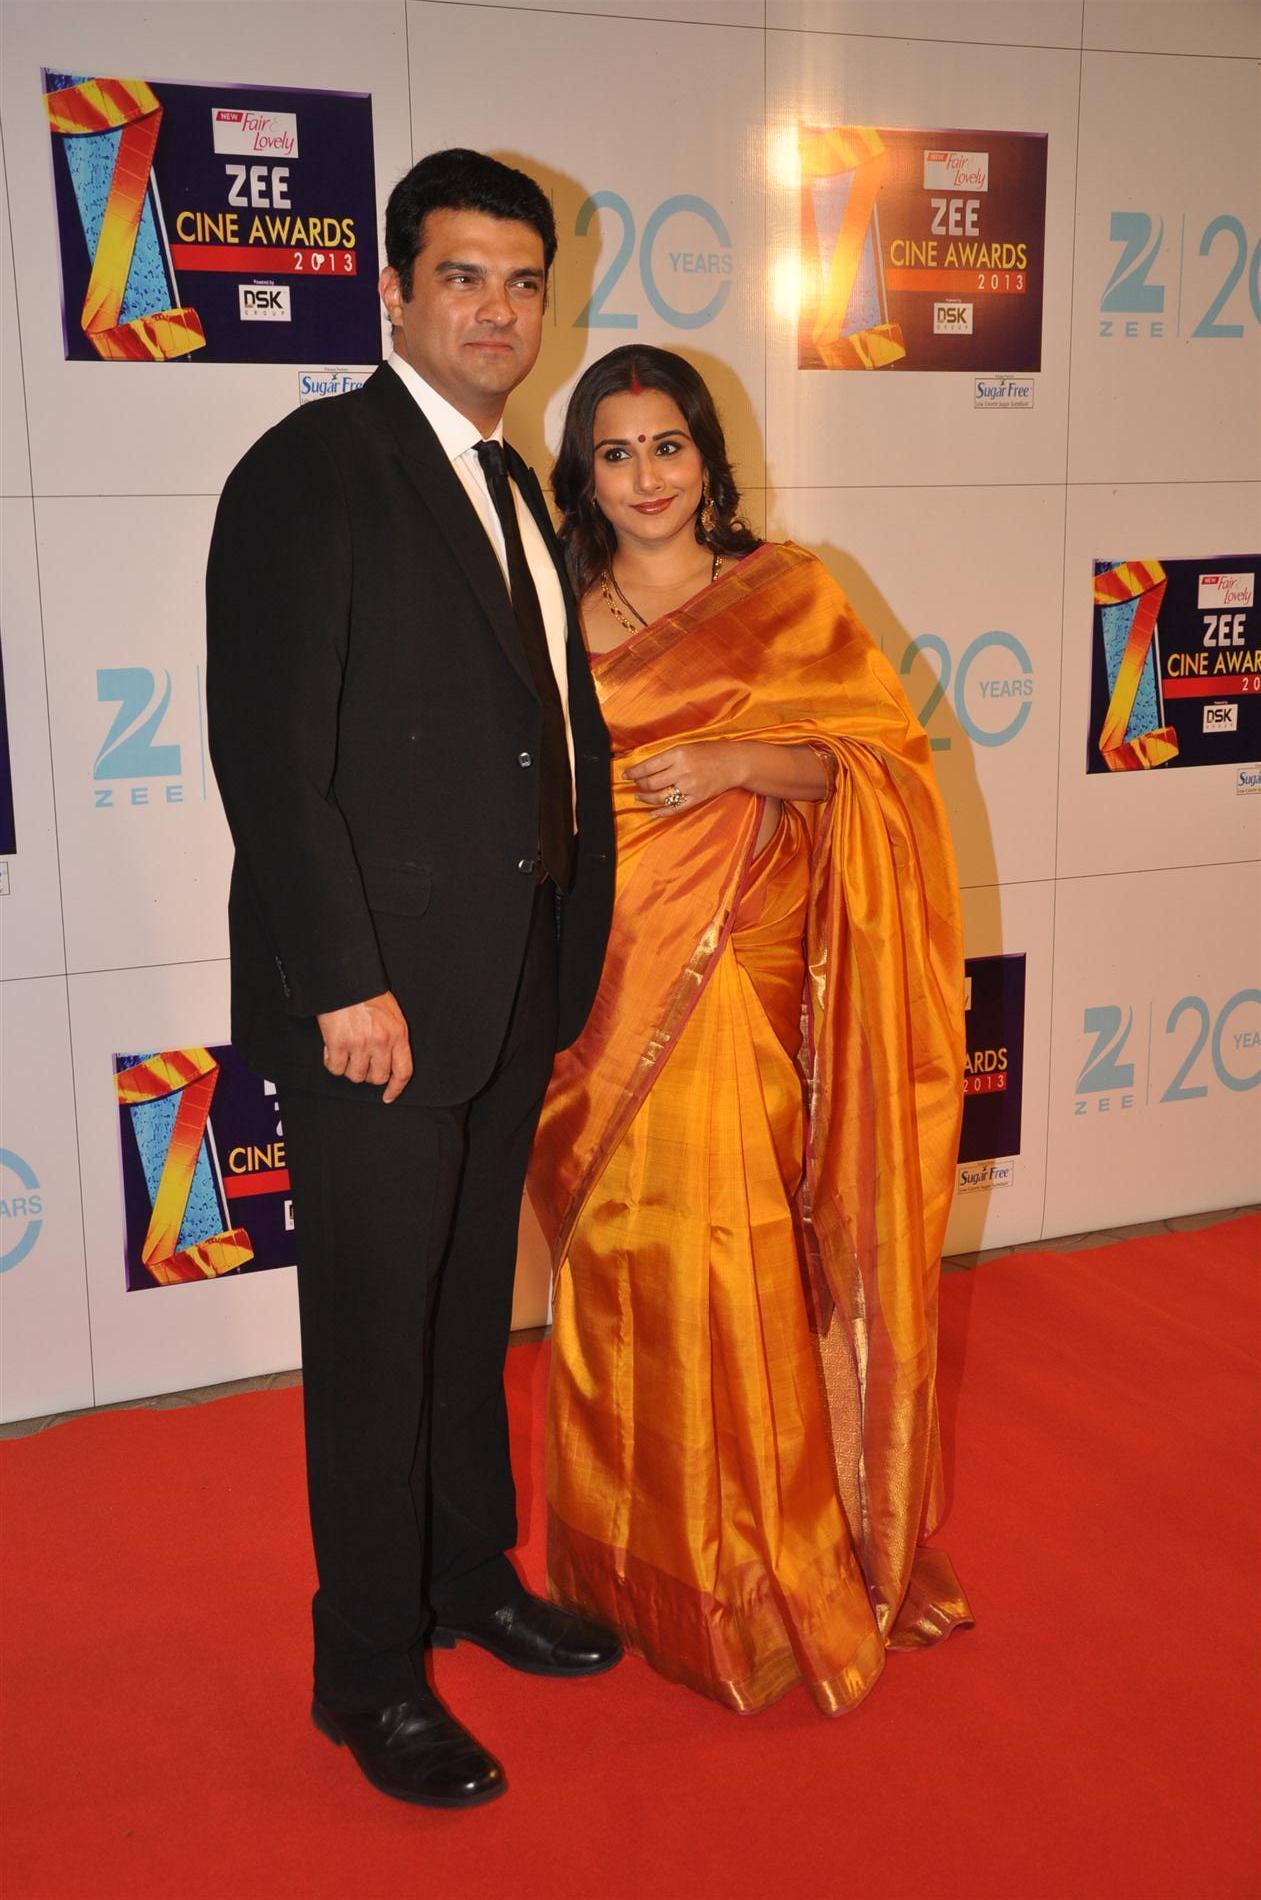 Siddharth Roy Kapur & Vidya Balan